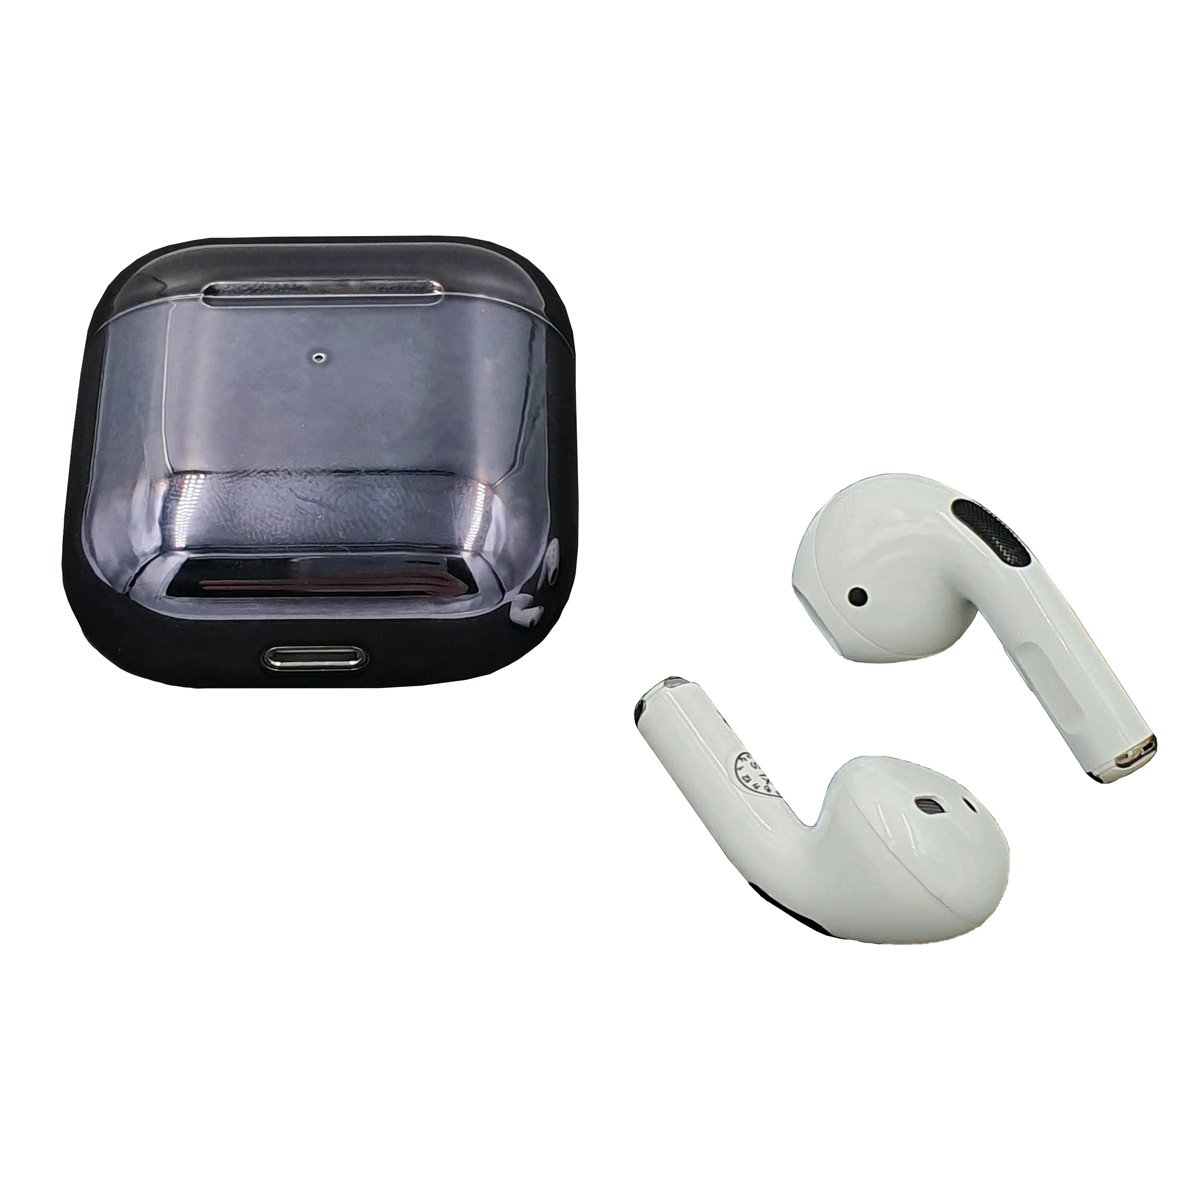 Fone de Ouvido Sem Fio Wireless Bluetooth Preto Pro4 5.0